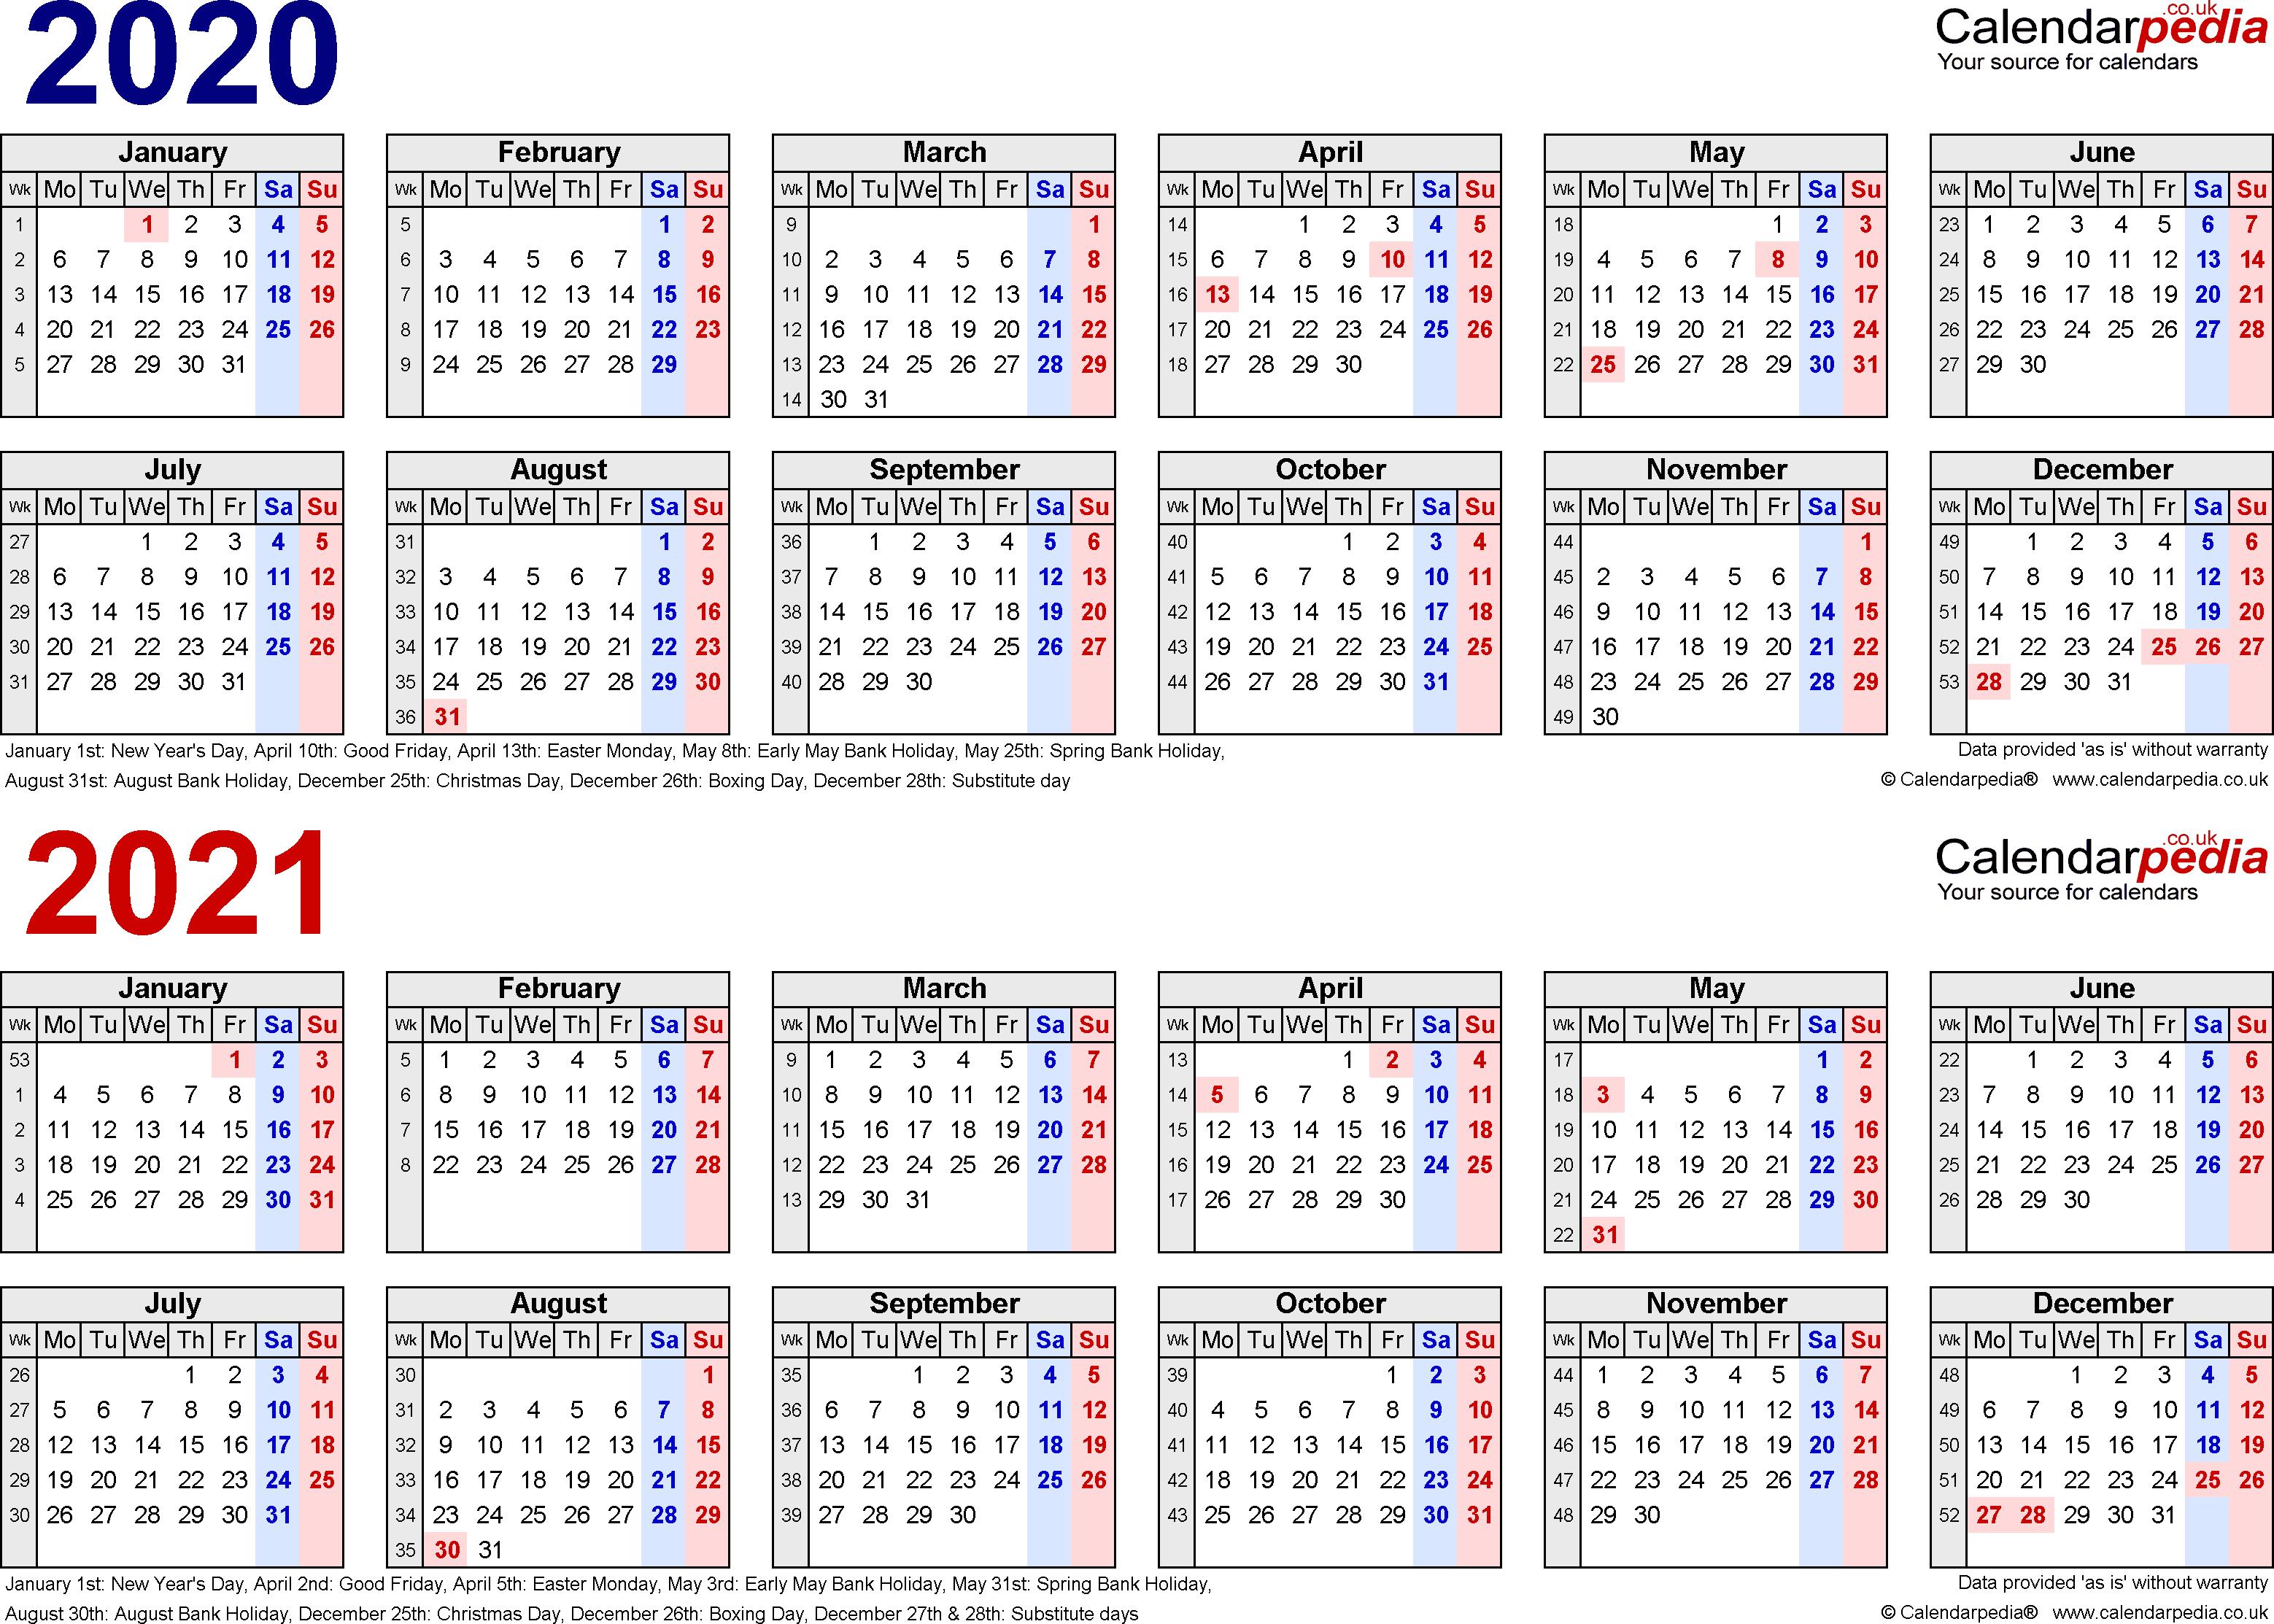 2020 Calendar Matches What Year